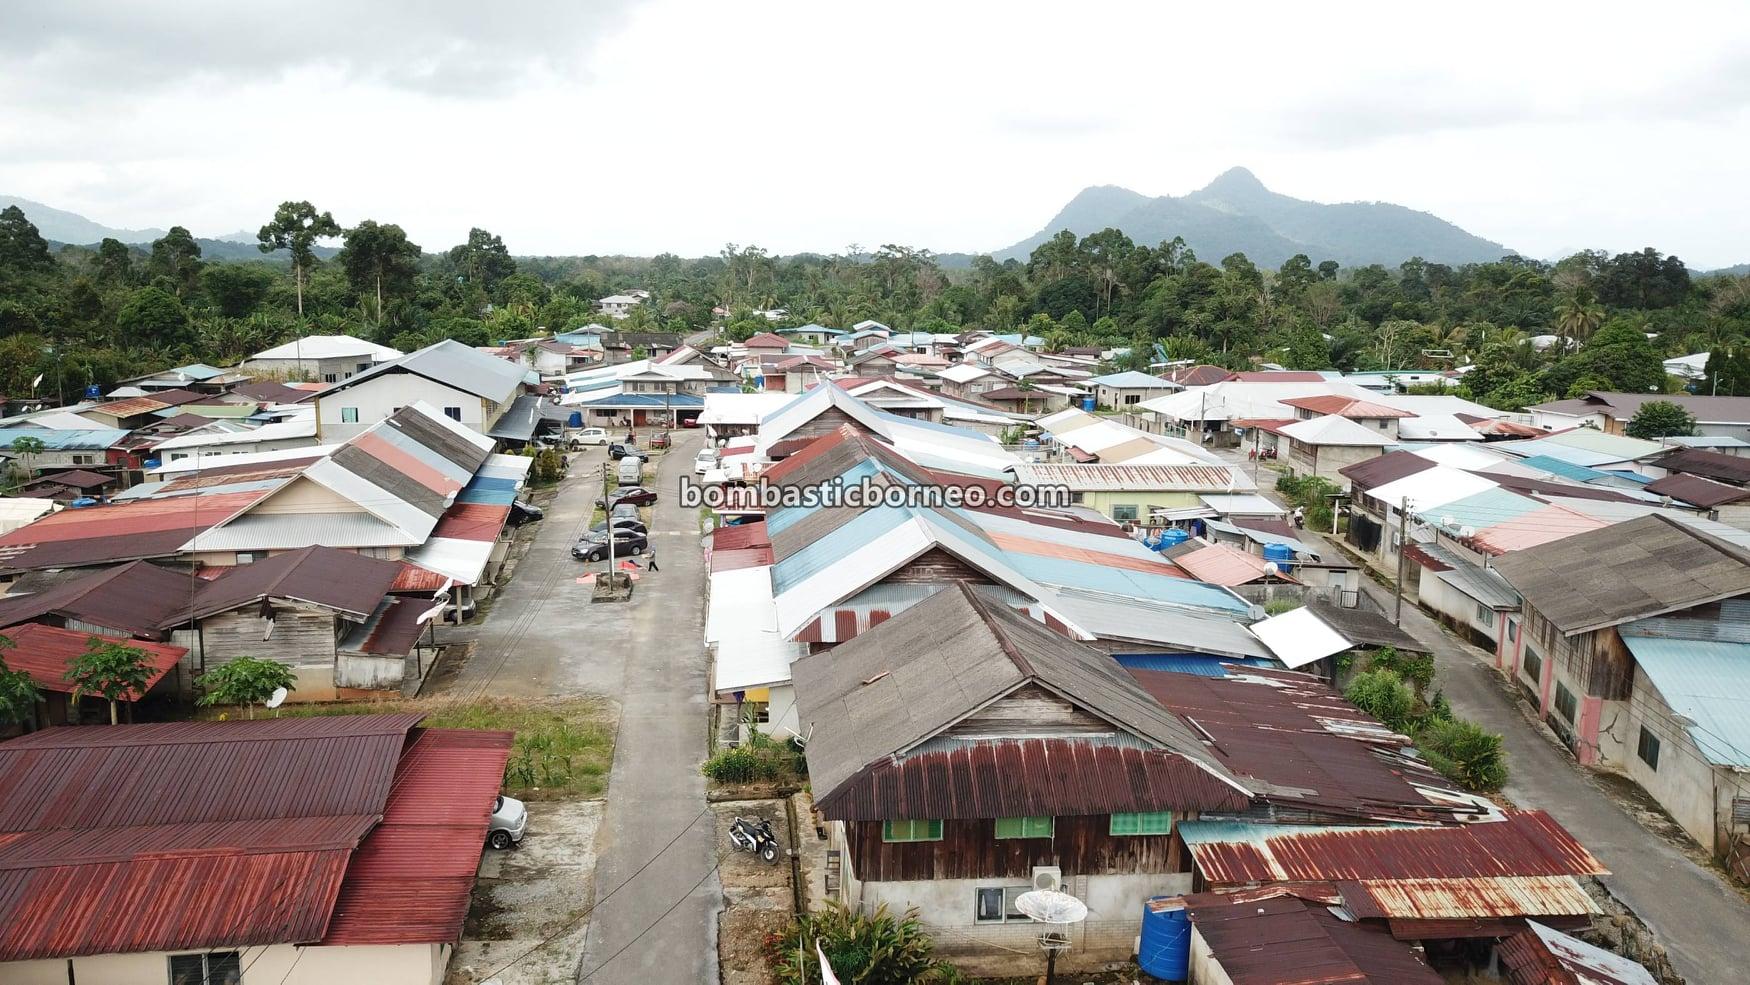 Village, Dayak Bidayuh, native, destination, exploration, Malaysia, objek wisata, Tourism, travel local, Trans Borneo, 马来西亚砂拉越, 西连比达友村